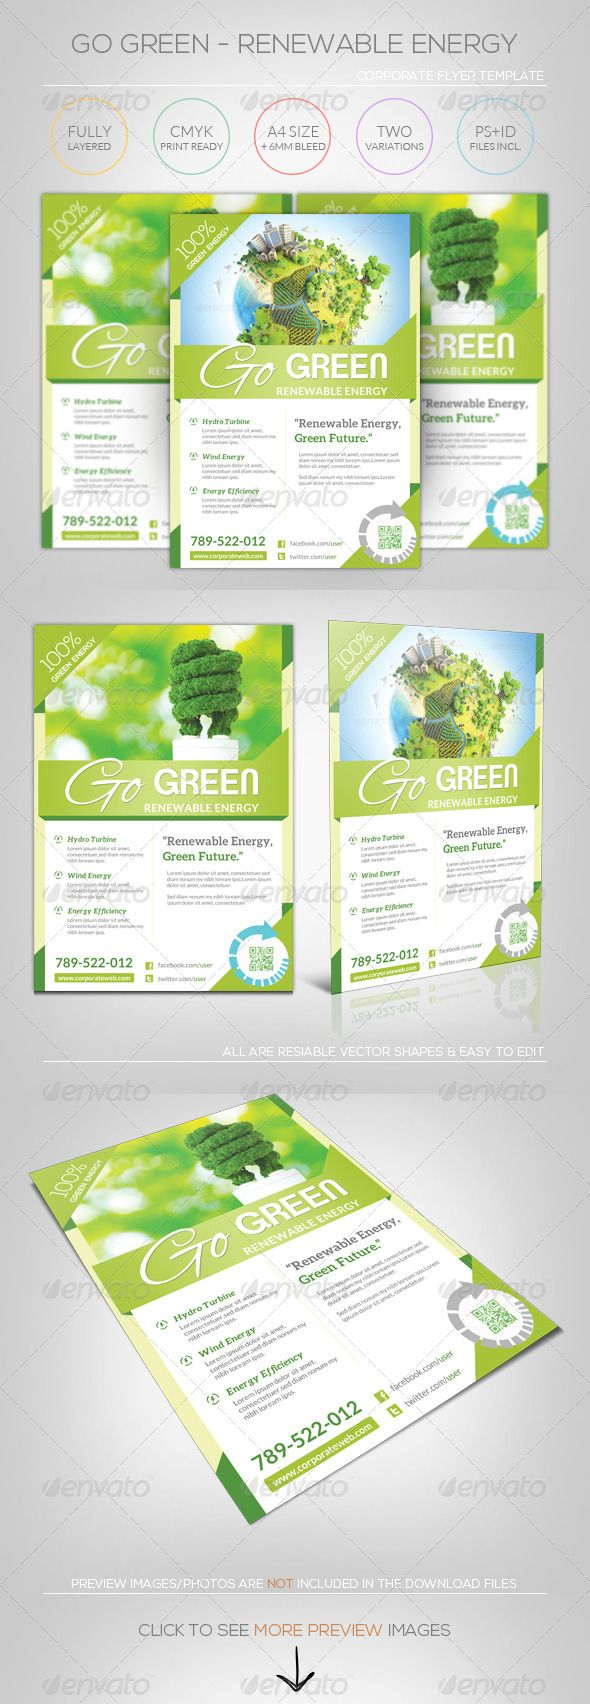 Renewable Energy - Go Green - Flyer Template